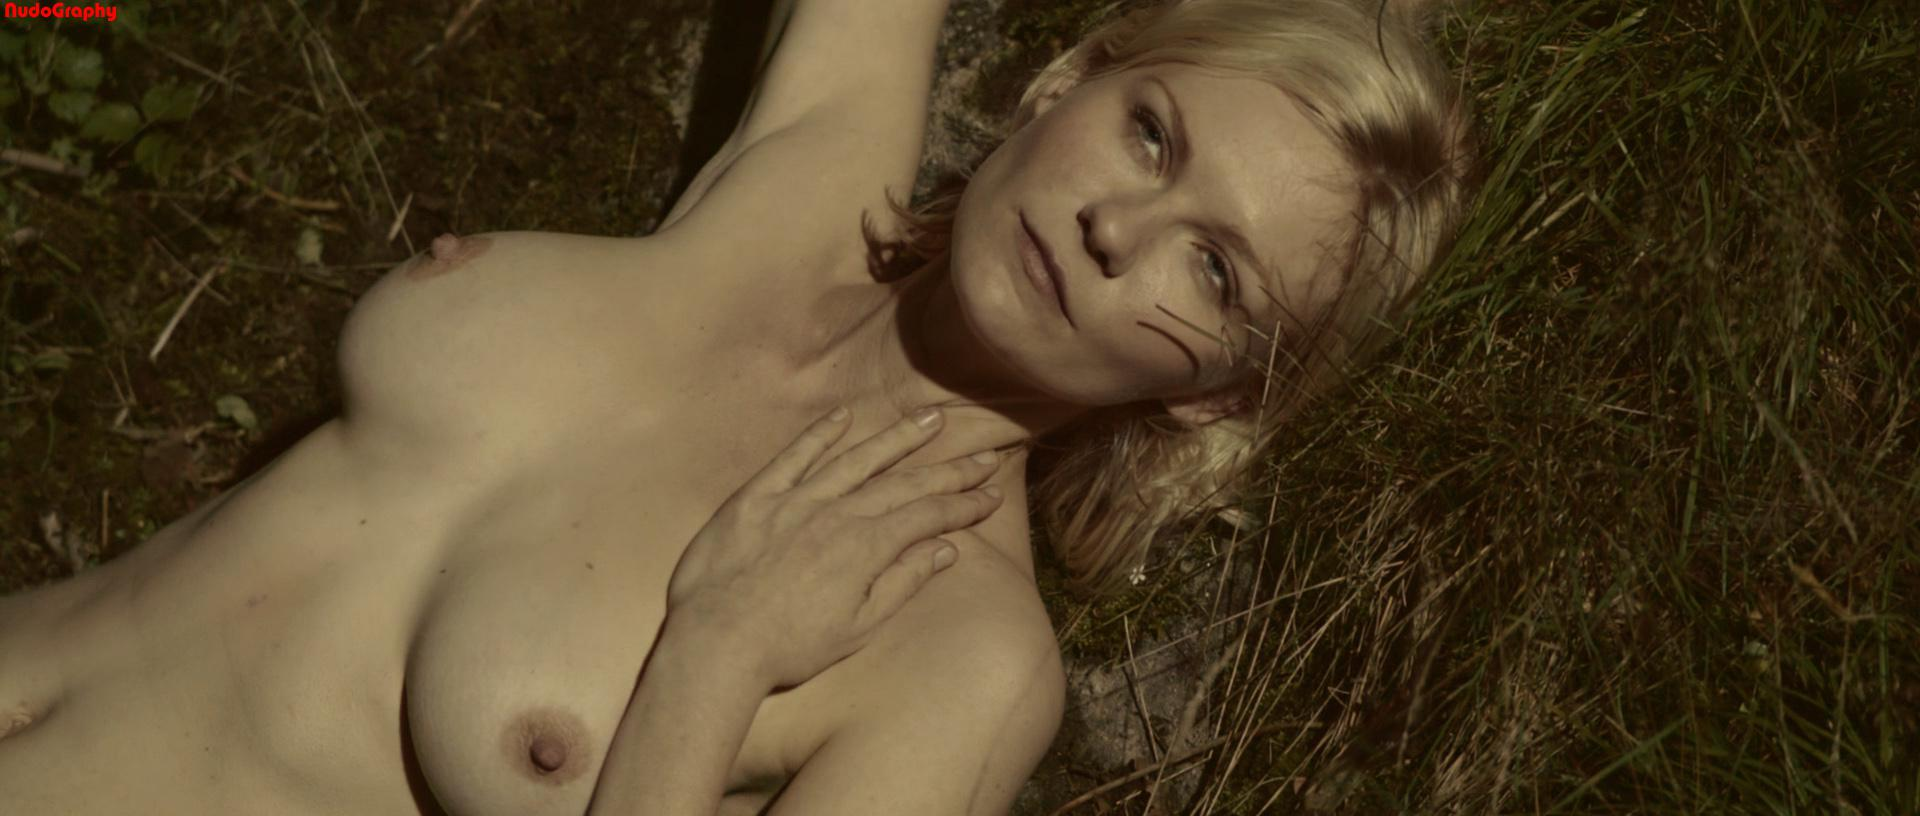 fotos Kirsten Dunst desnuda